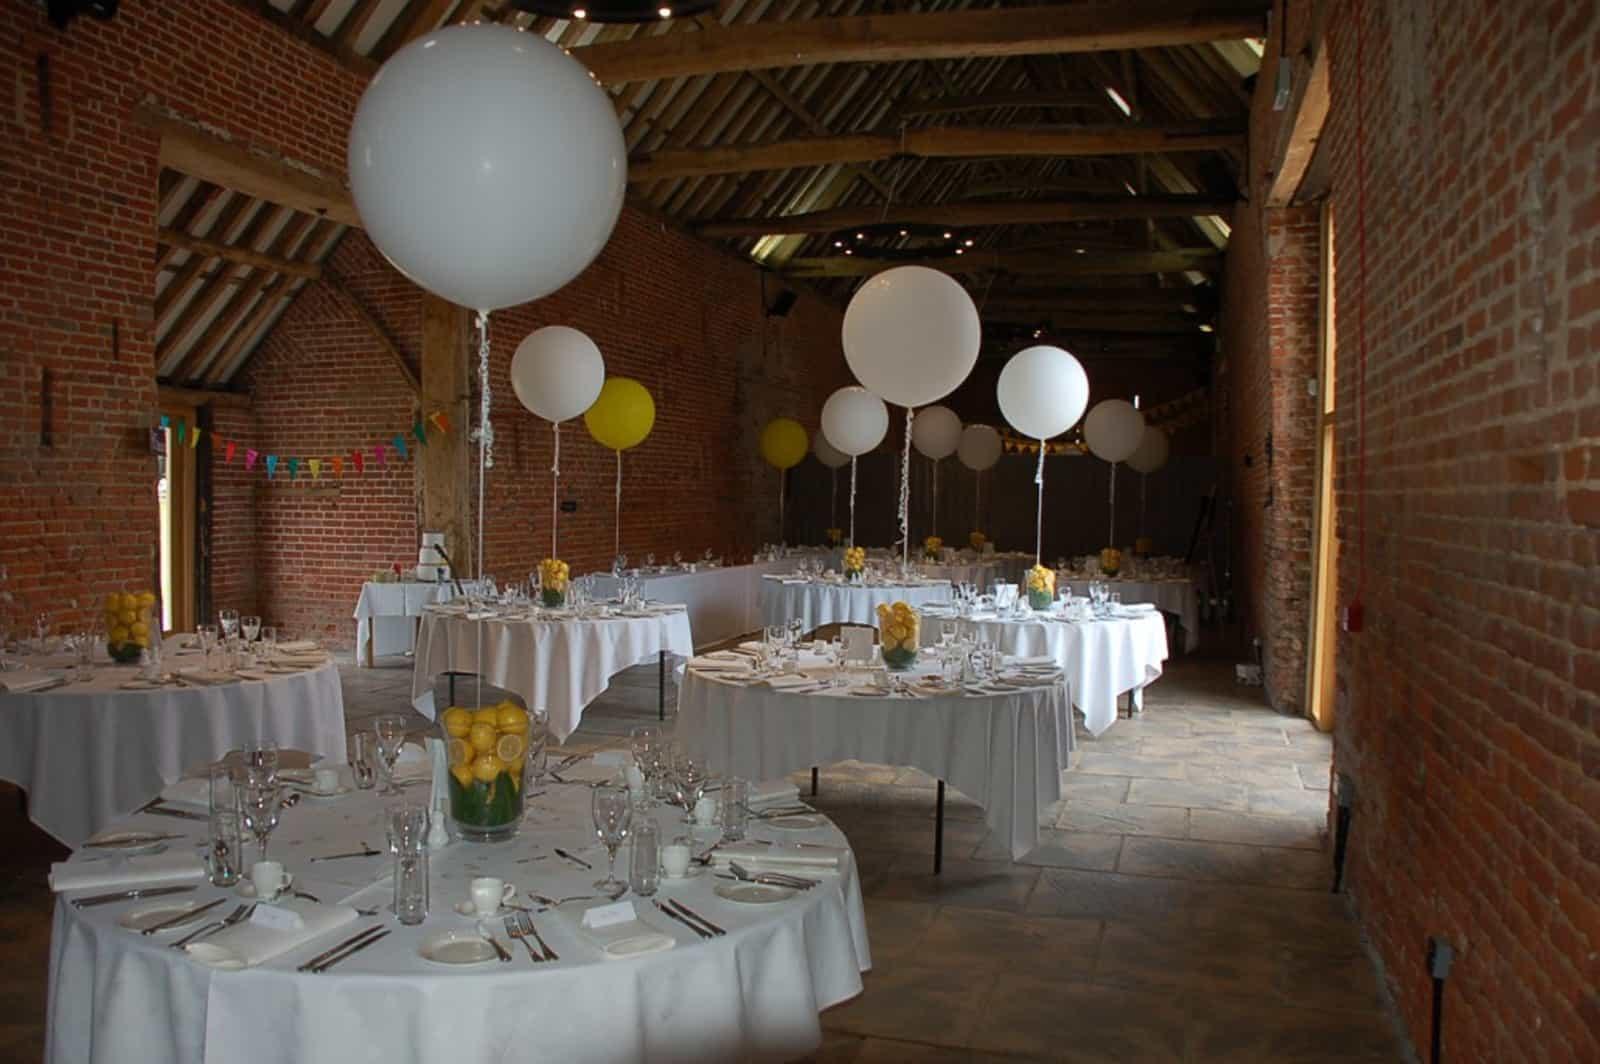 Large Balloons and Lemons themed wedding